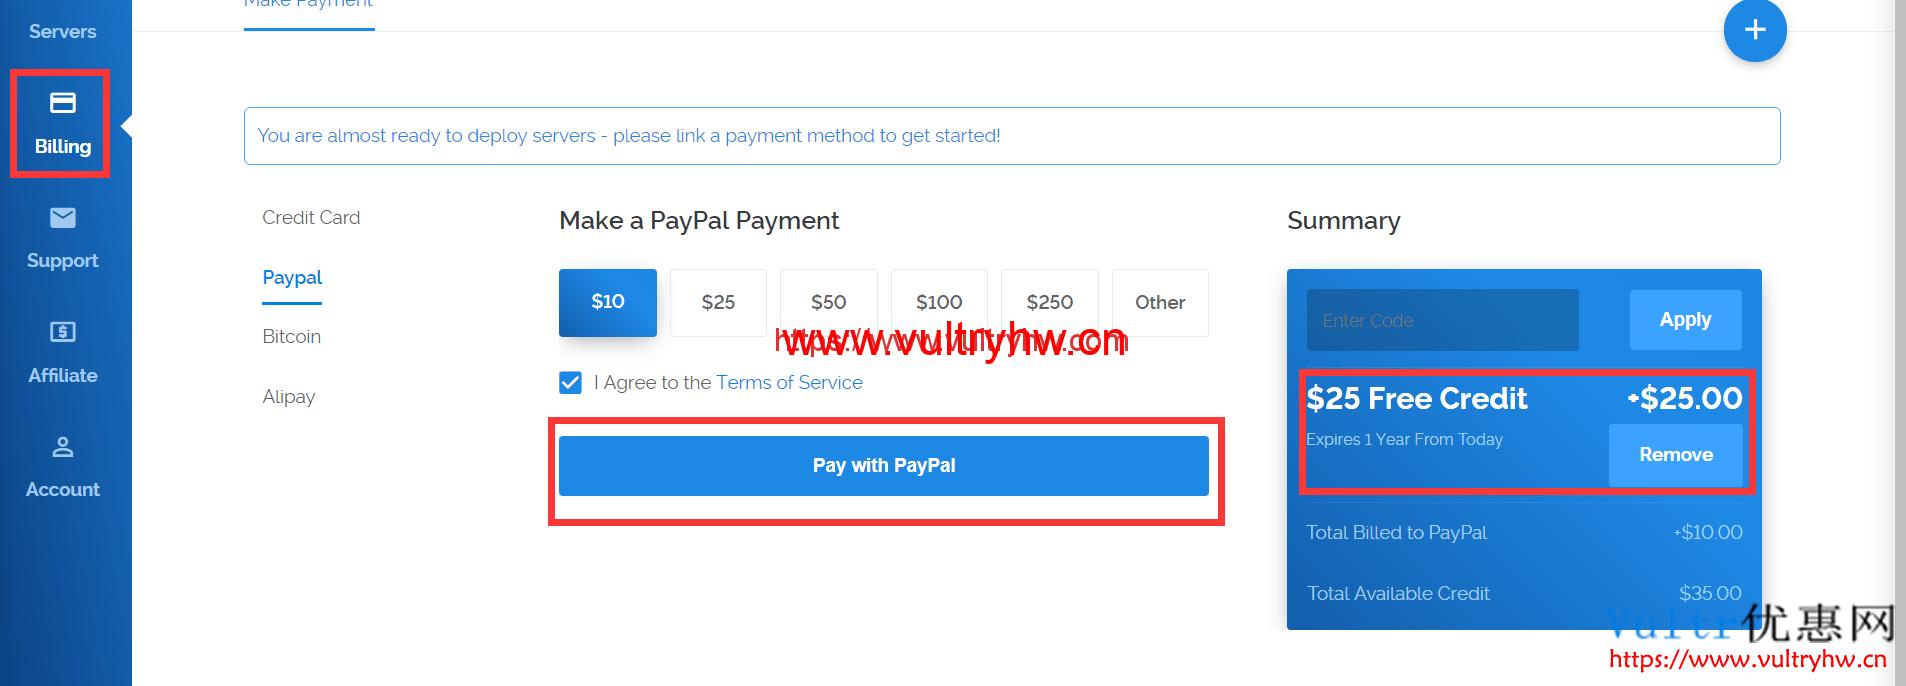 Vultr送25美元优惠码